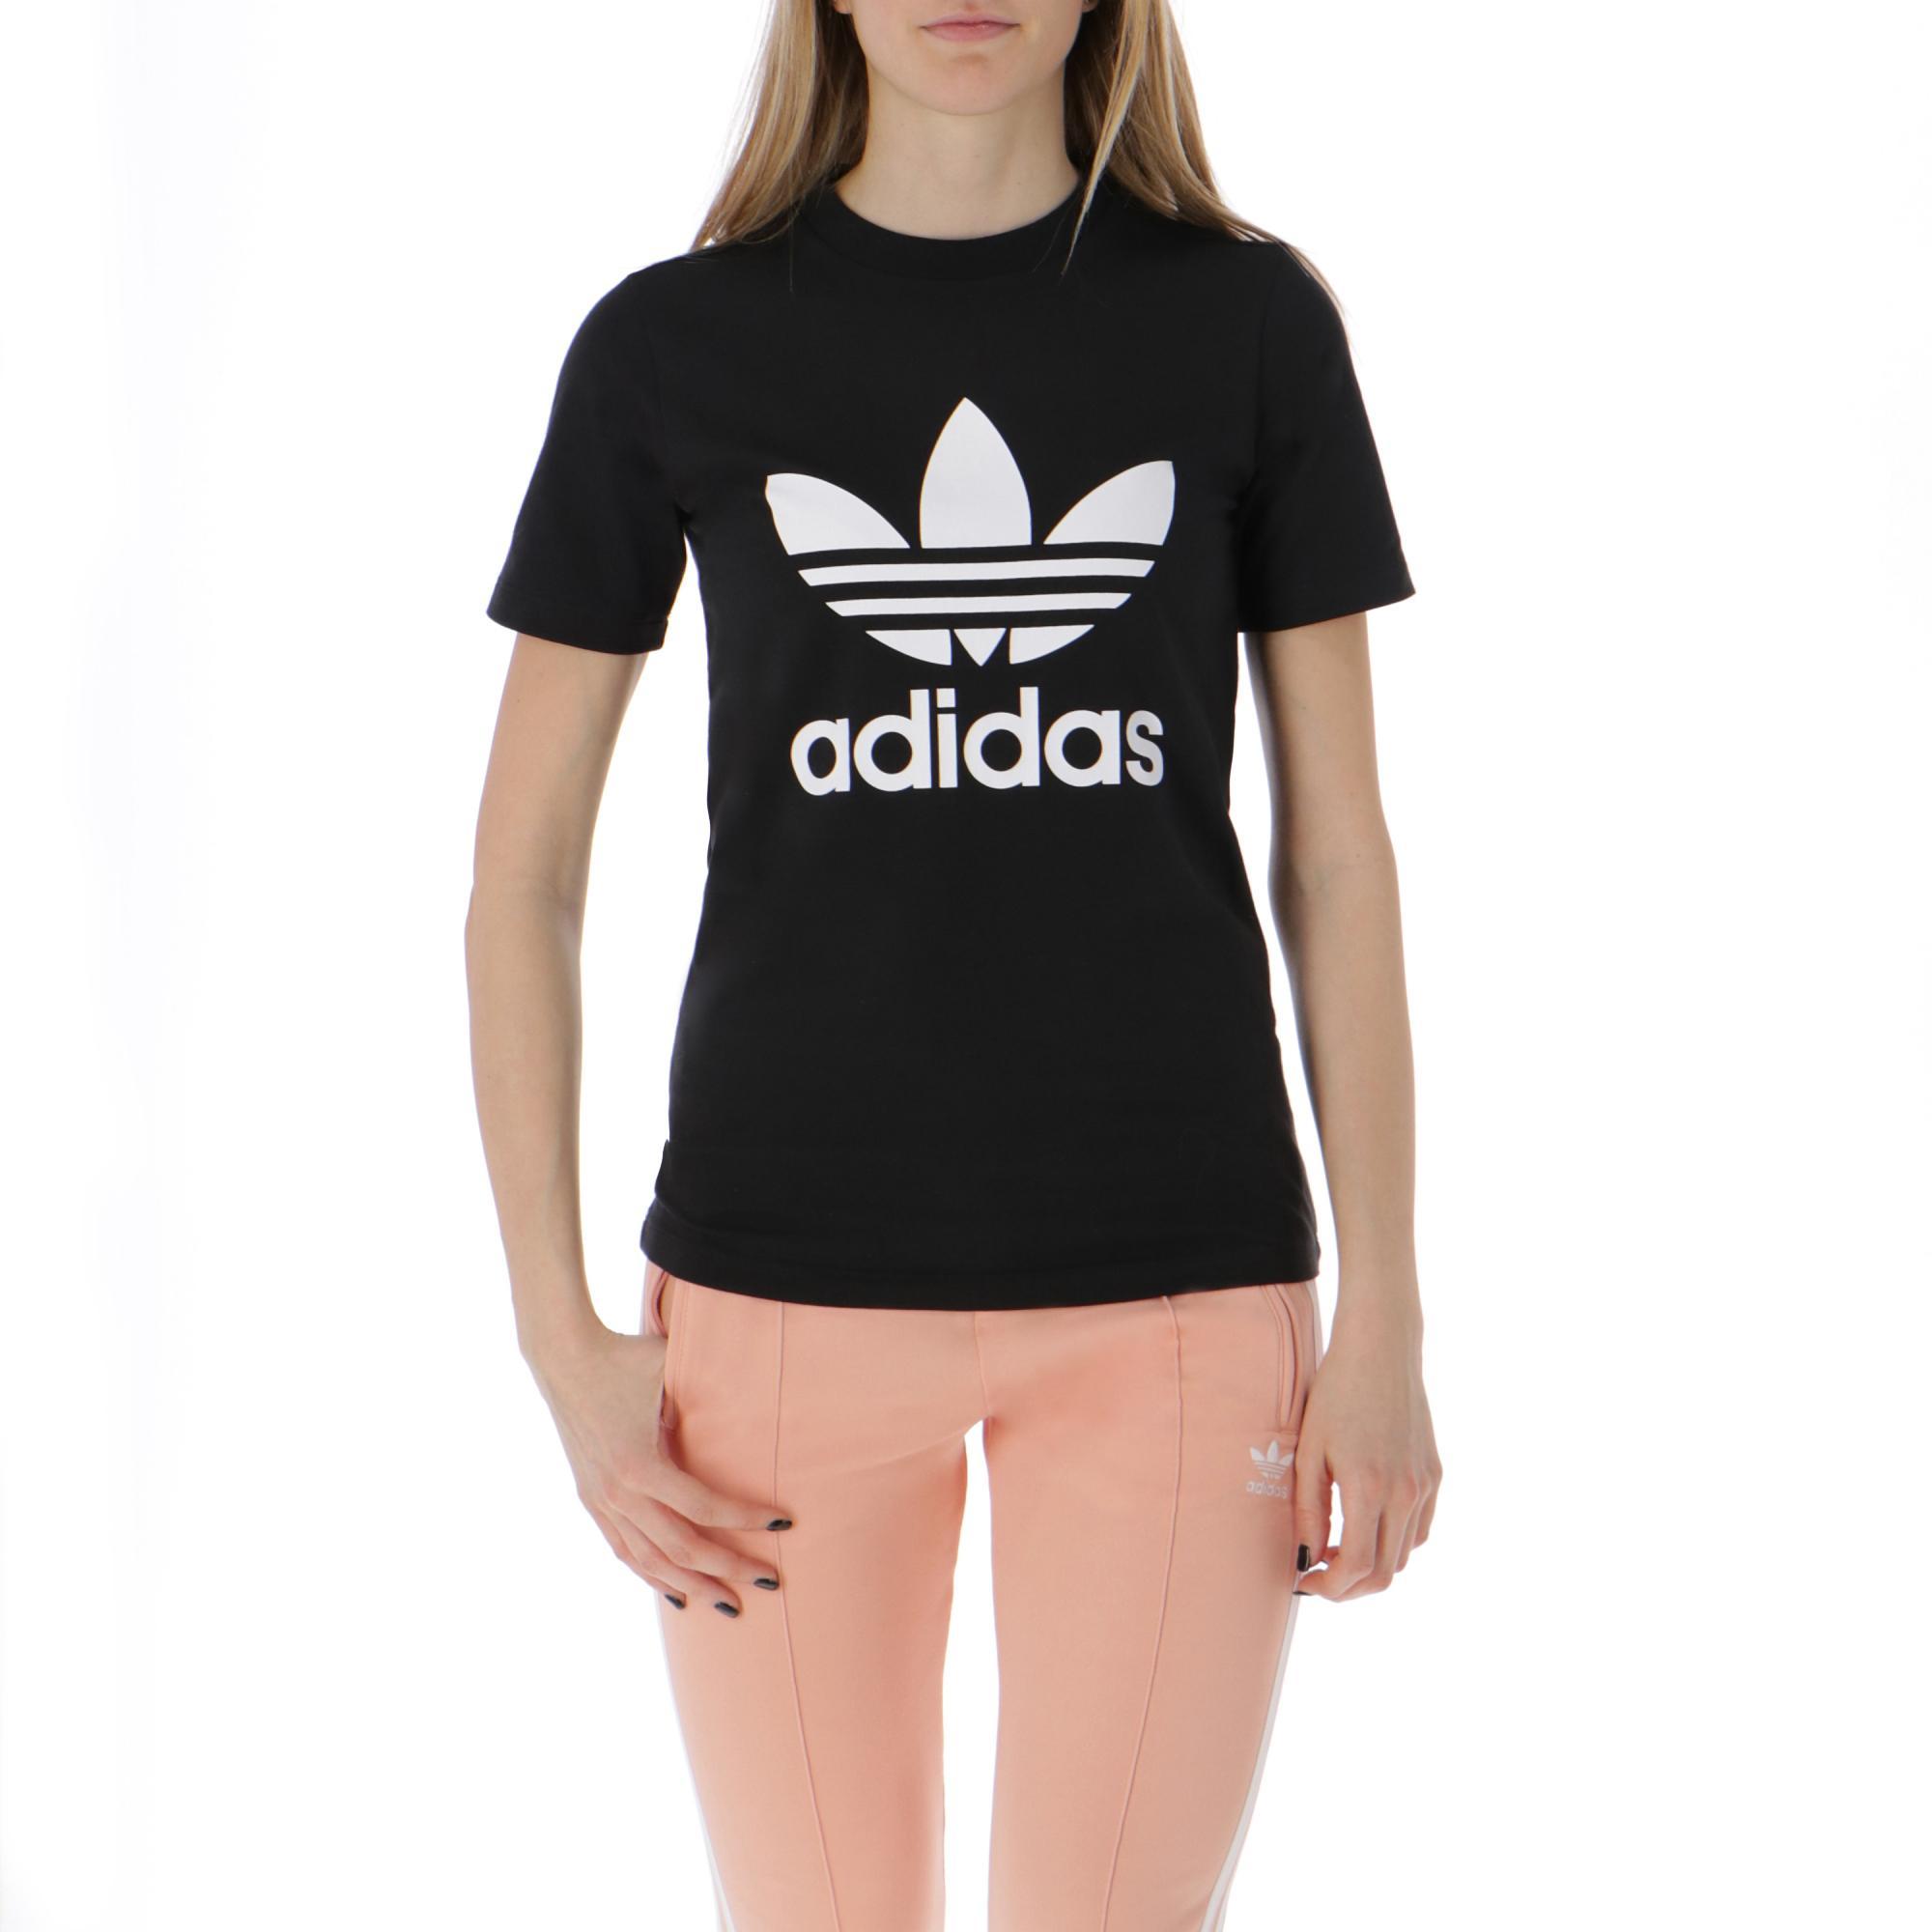 e2ccc7d331d Adidas Trefoil Tee Black White | Treesse